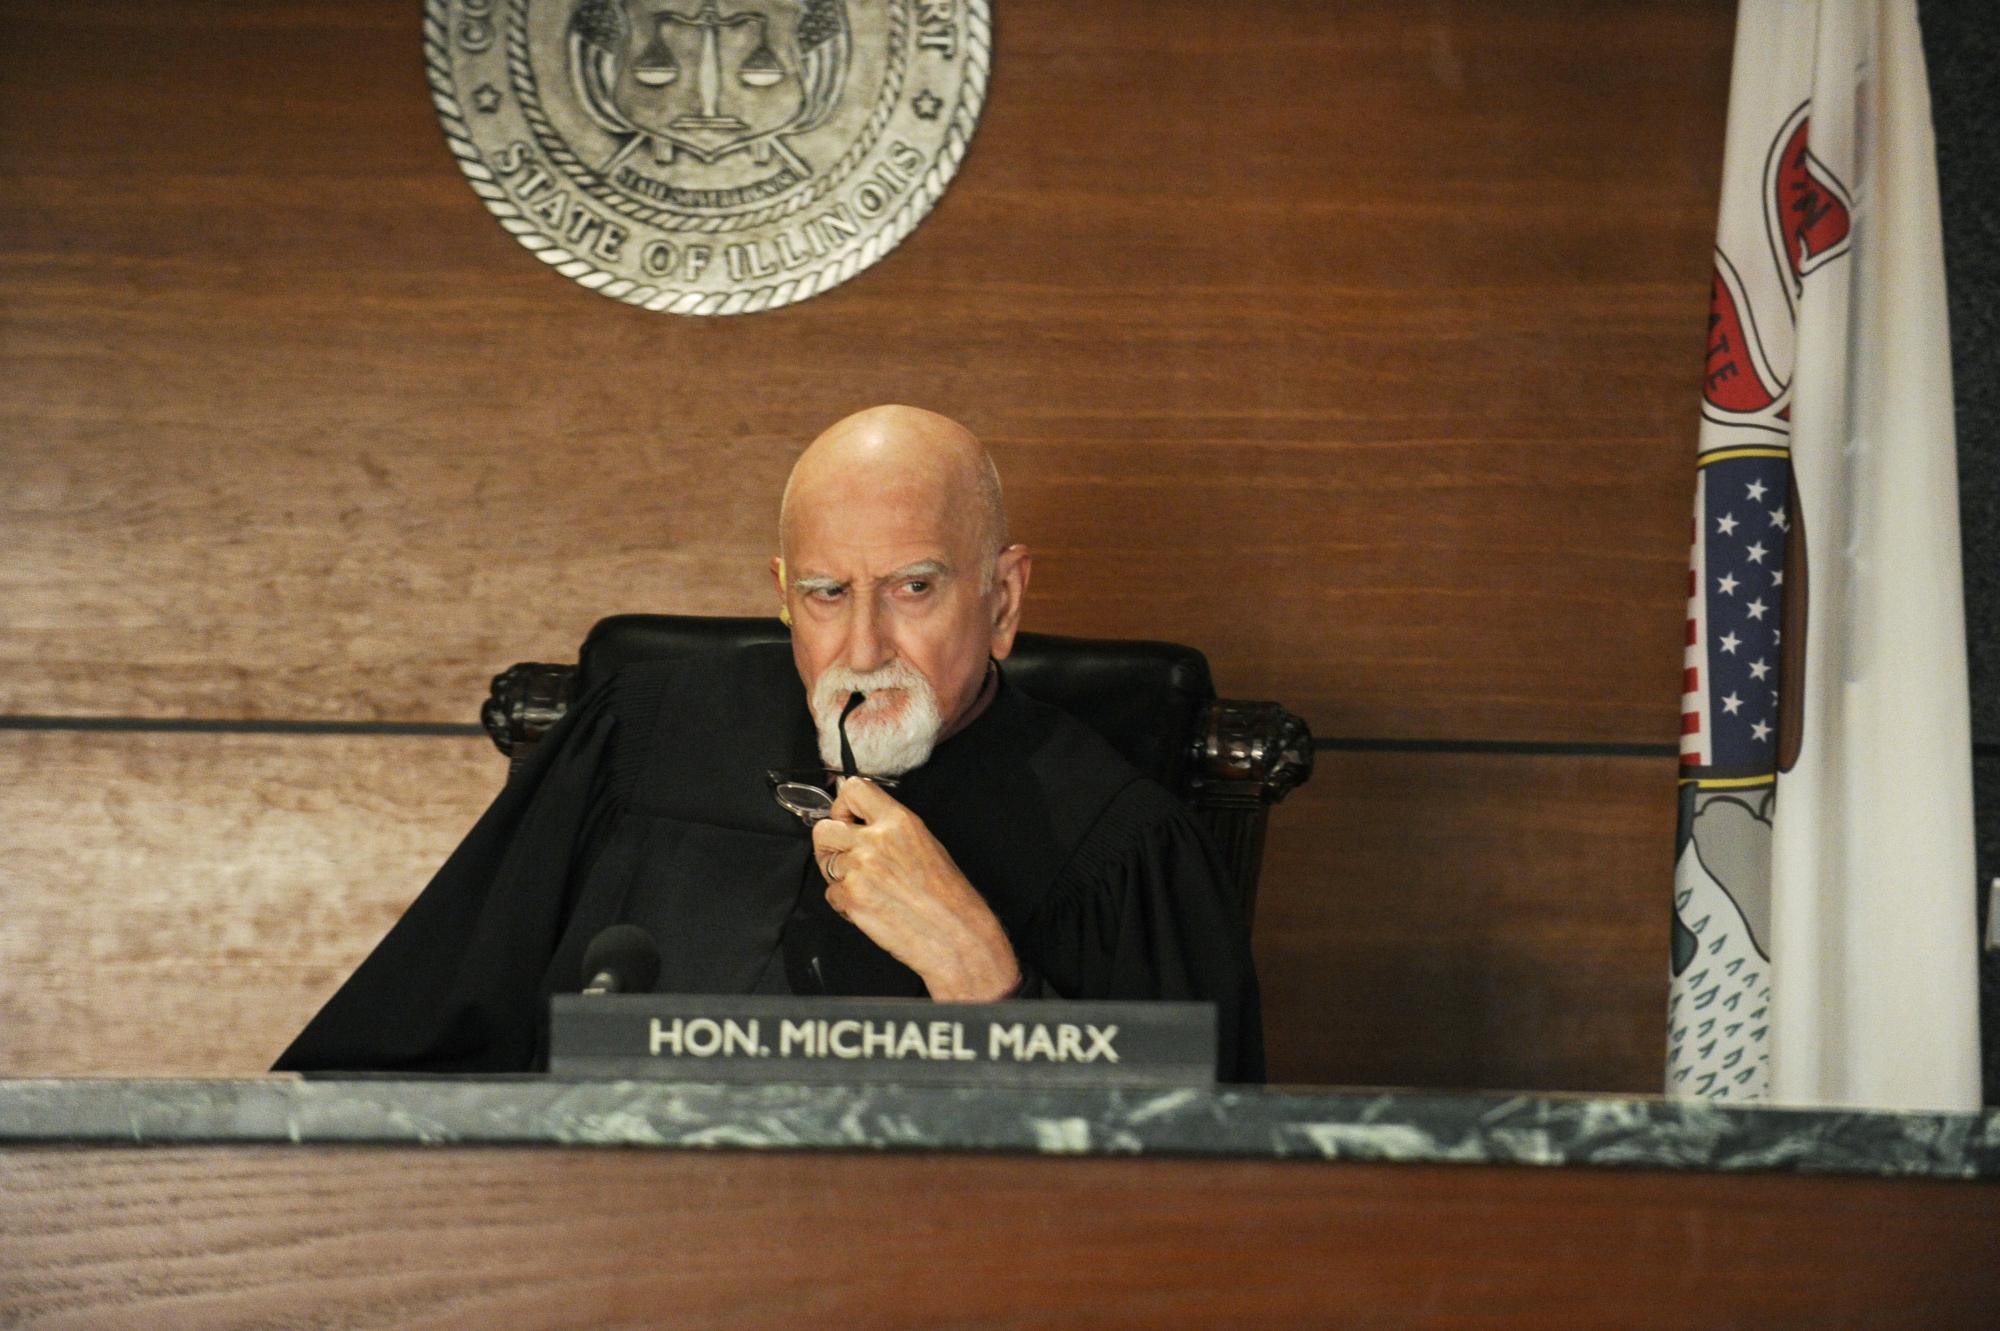 Judge Michael